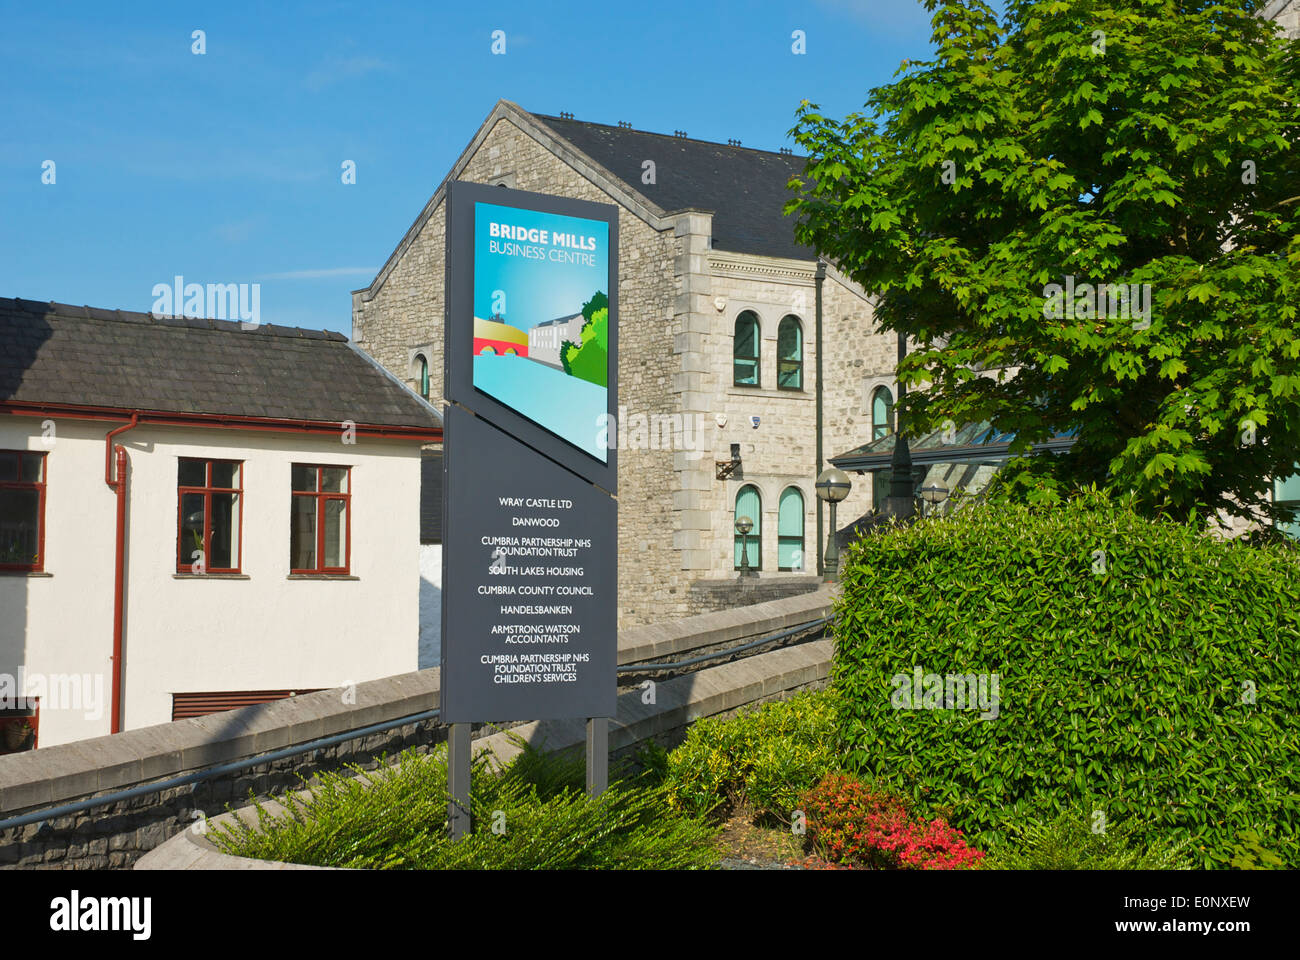 Sign for Bridge Mills Business Centre, Kendal town, Cumbria, England UK - Stock Image